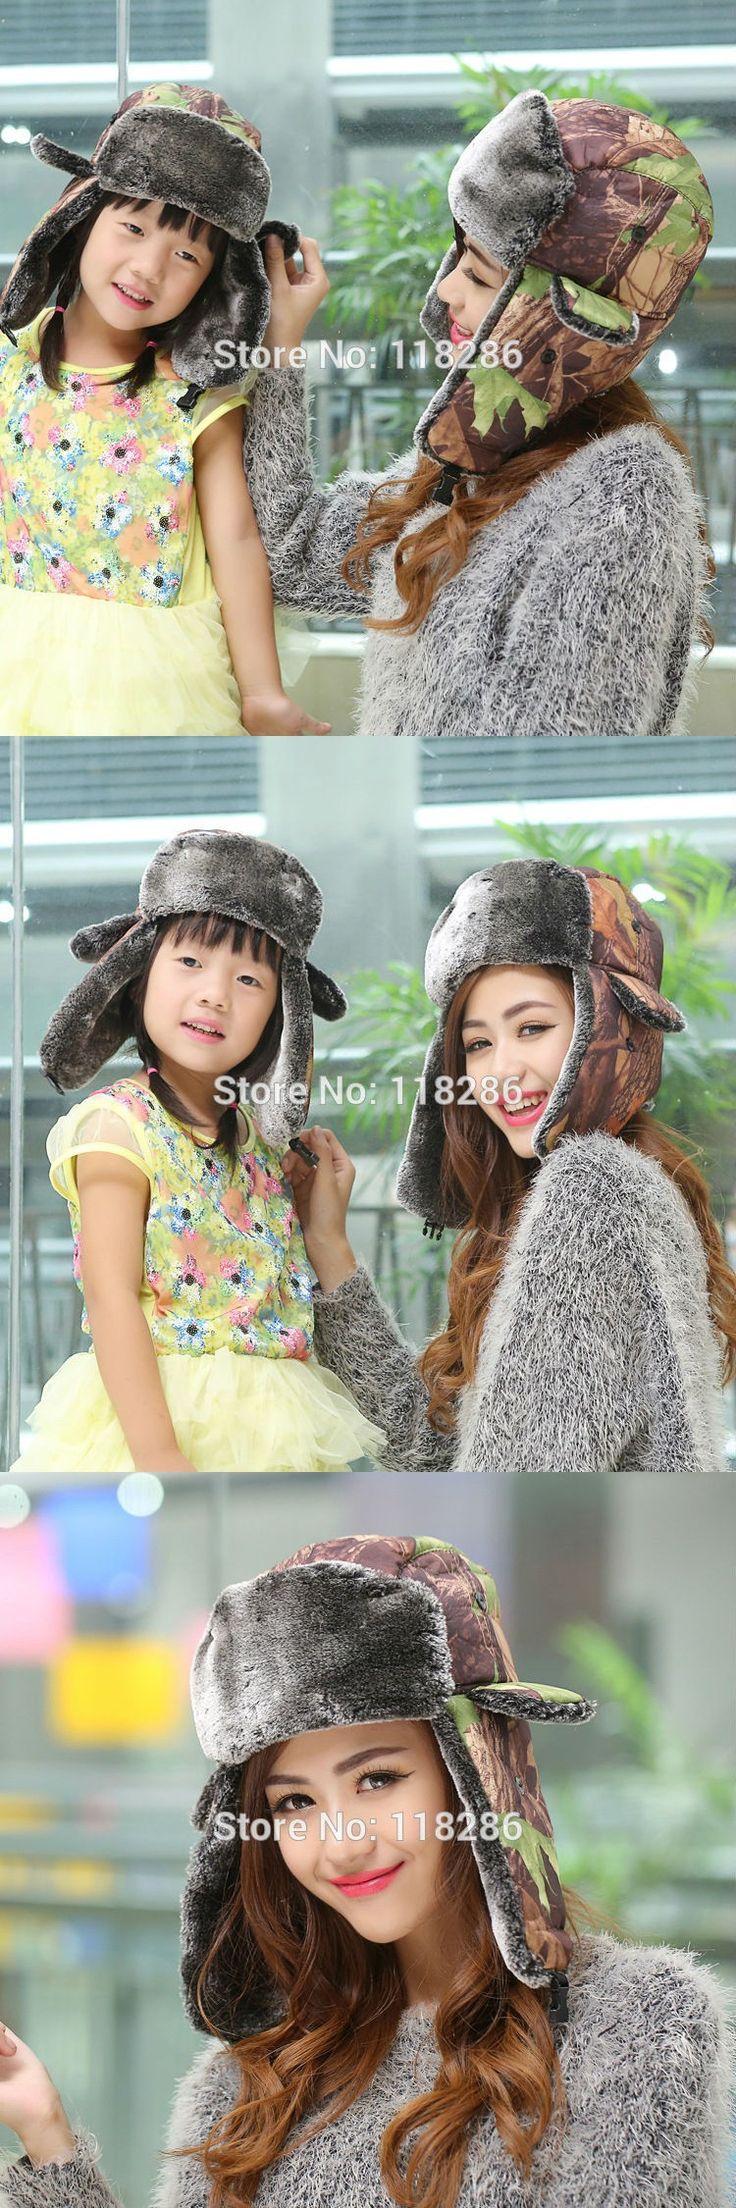 Fashion Camo Winter Earflap Hat Outdoor Thicken Women Men Bomber Hat Faux Fur Camouflage Russian Winter Hat $10.79